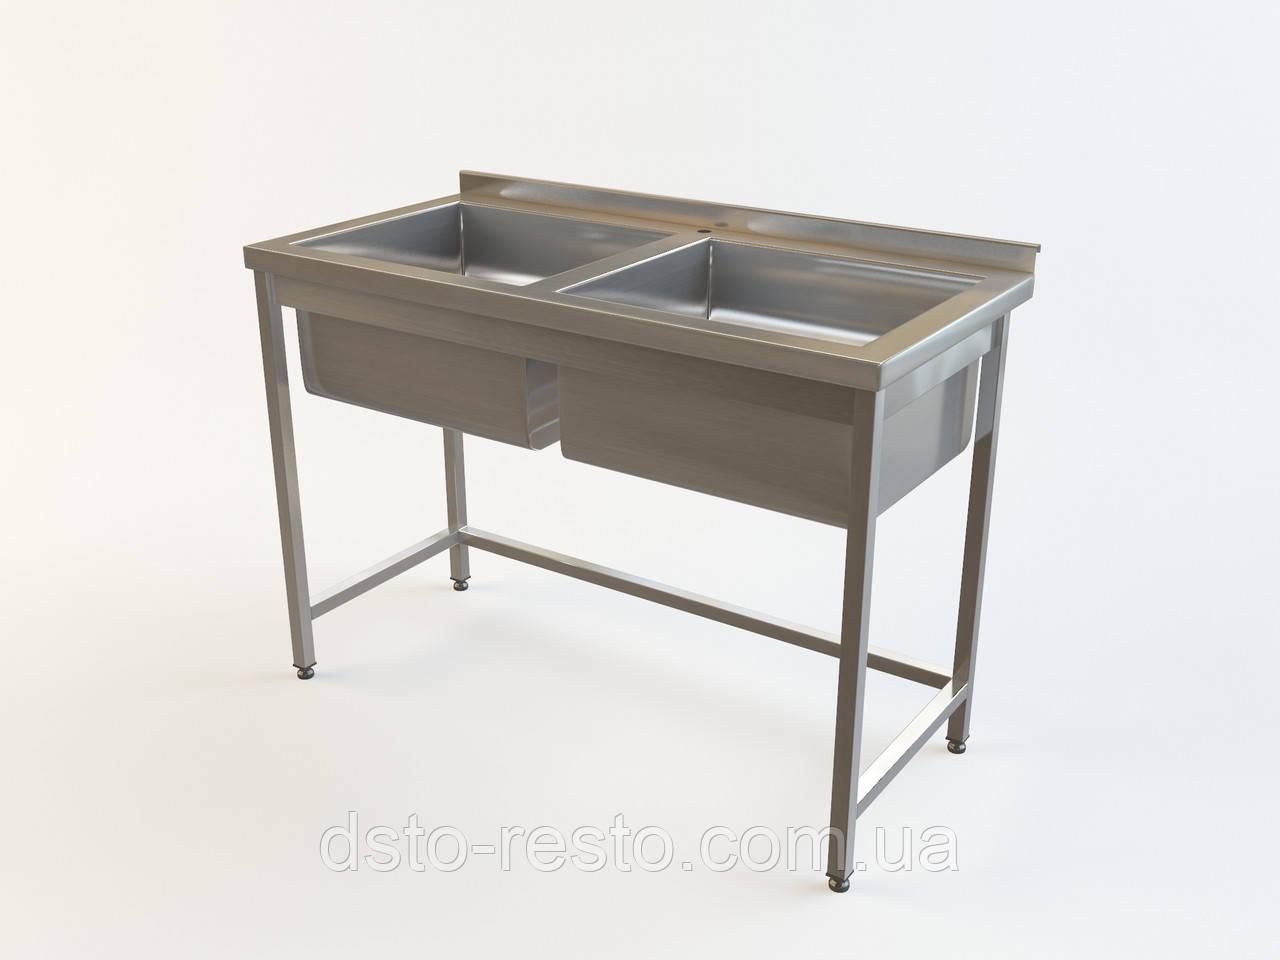 Ванна моечная глубокая 40 см 1300/600/850 мм